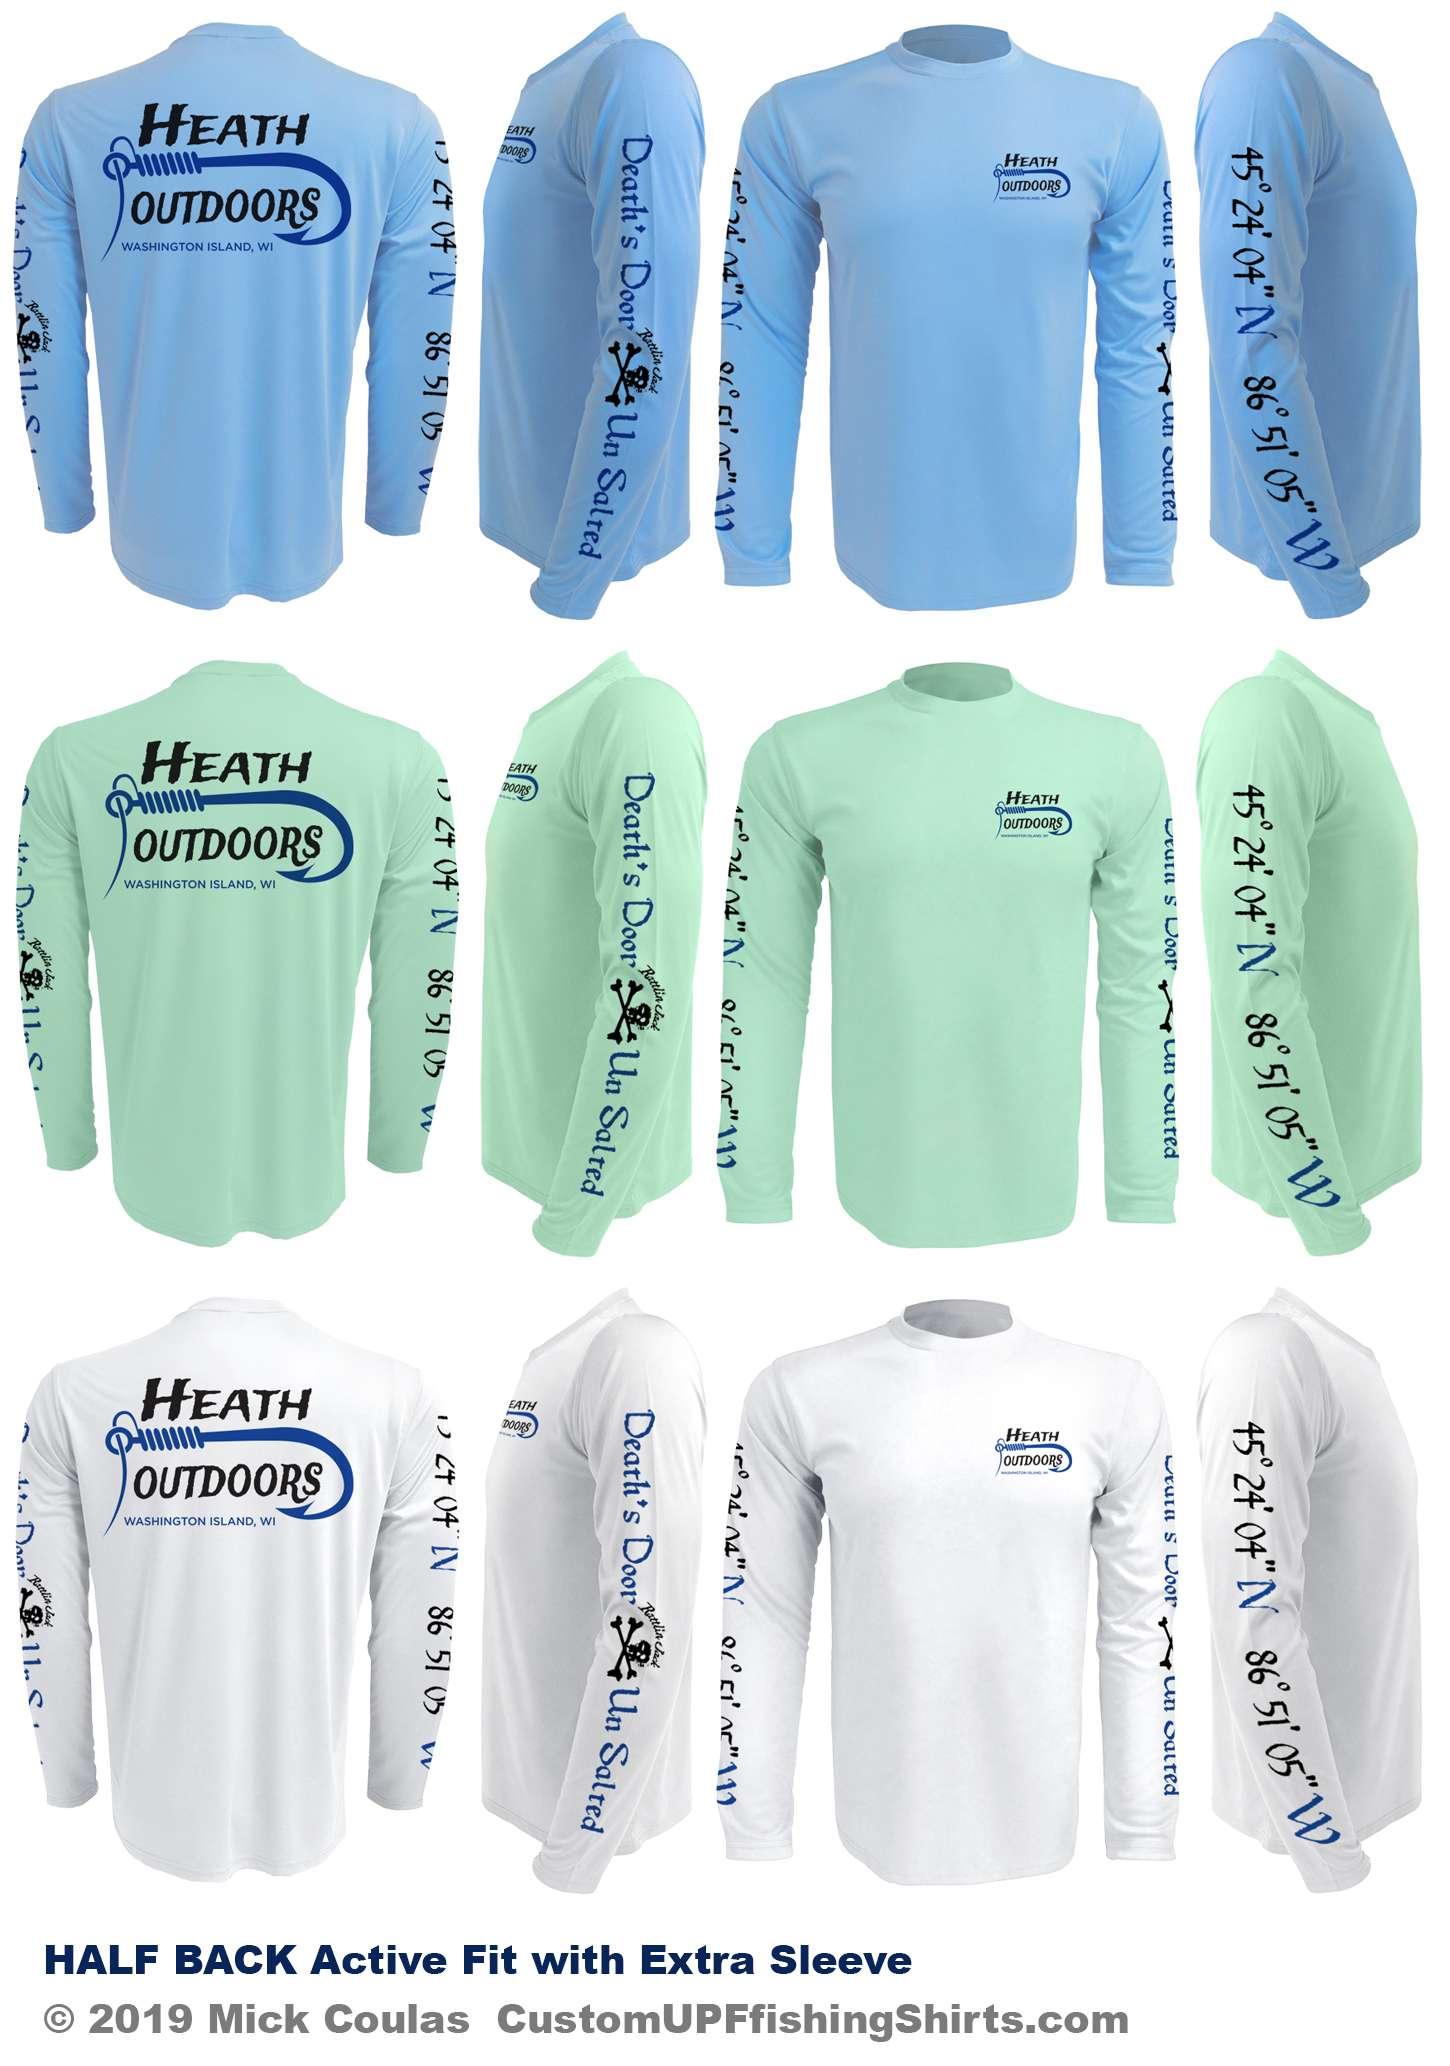 Half-Back-custom-upf-fishing-shirts-Heath-outdoors